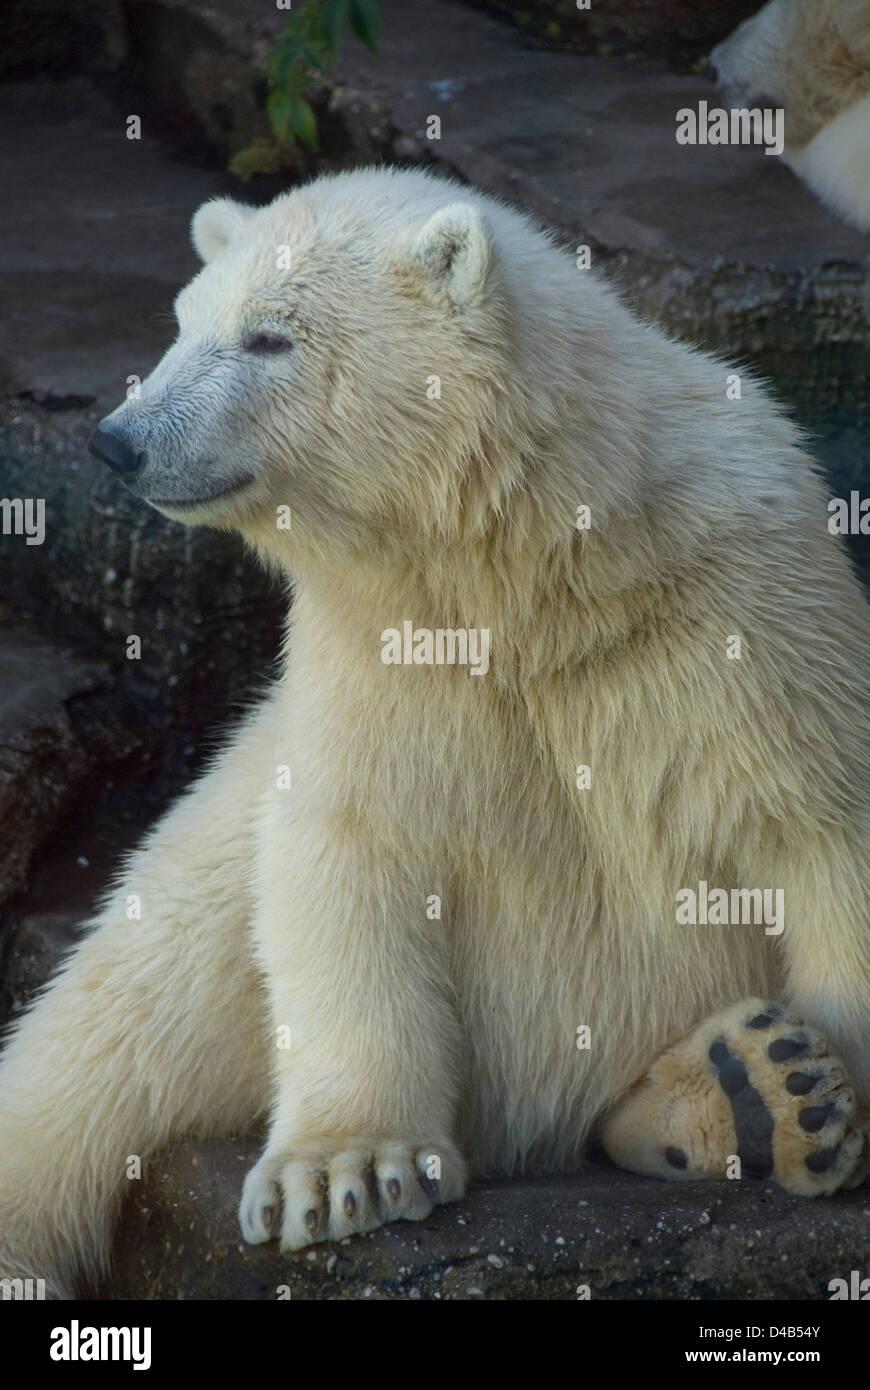 Young polar bear sitting on a rock, zoo Schönbrunn, Vienna, Austria Stock Photo